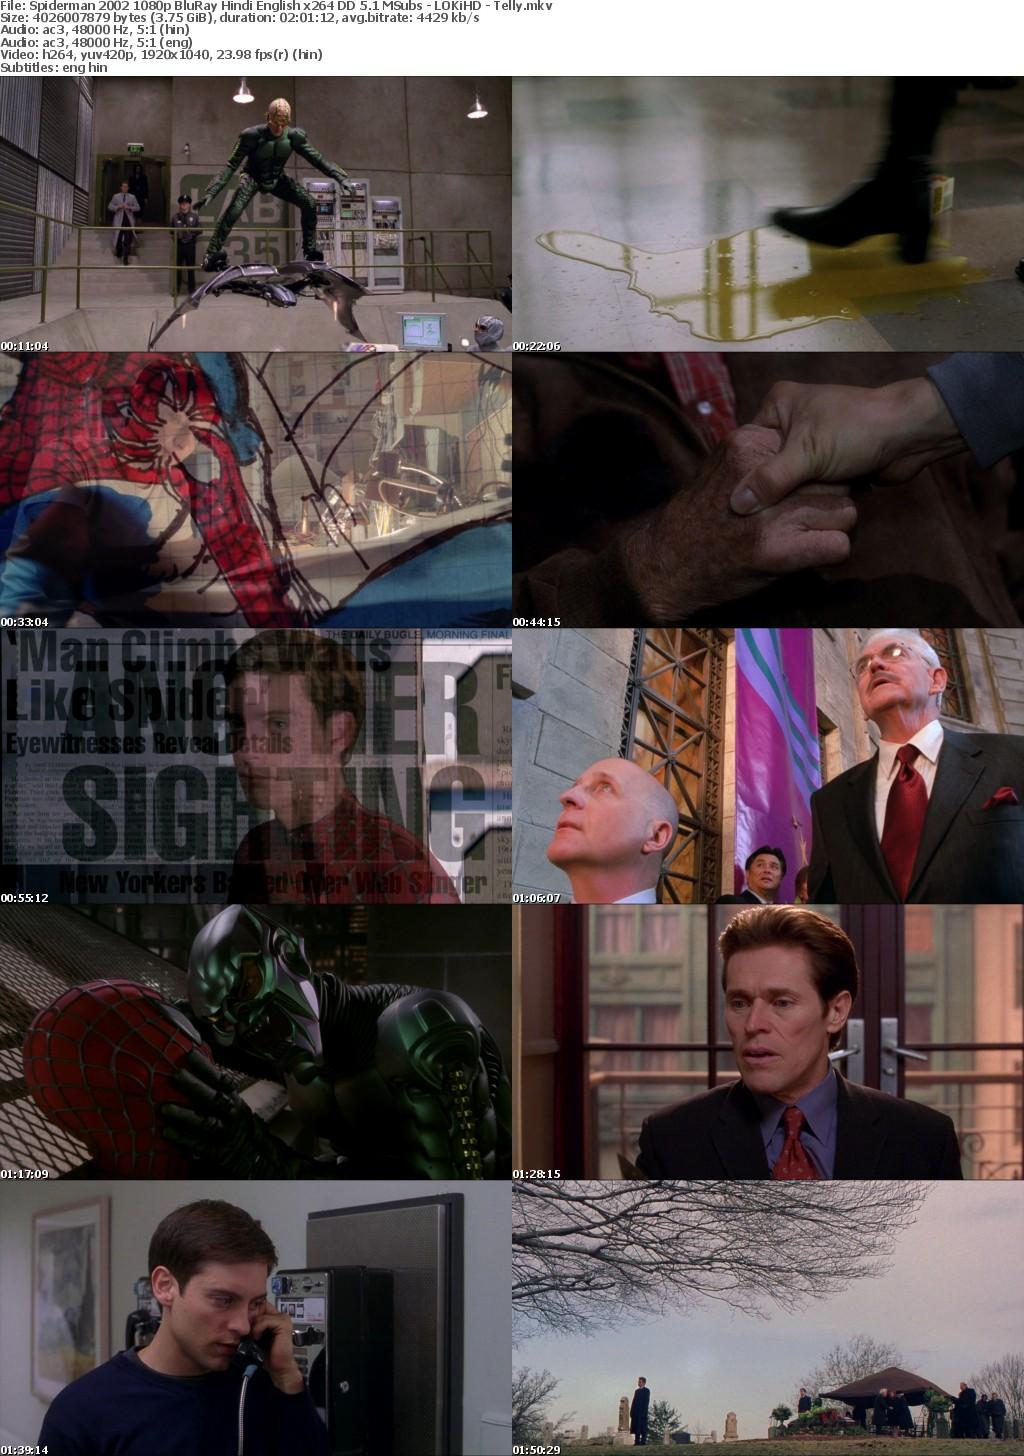 Spiderman (2002) 1080p BluRay Hindi English x264 DD 5.1 MSubs - LOKiHD - Telly